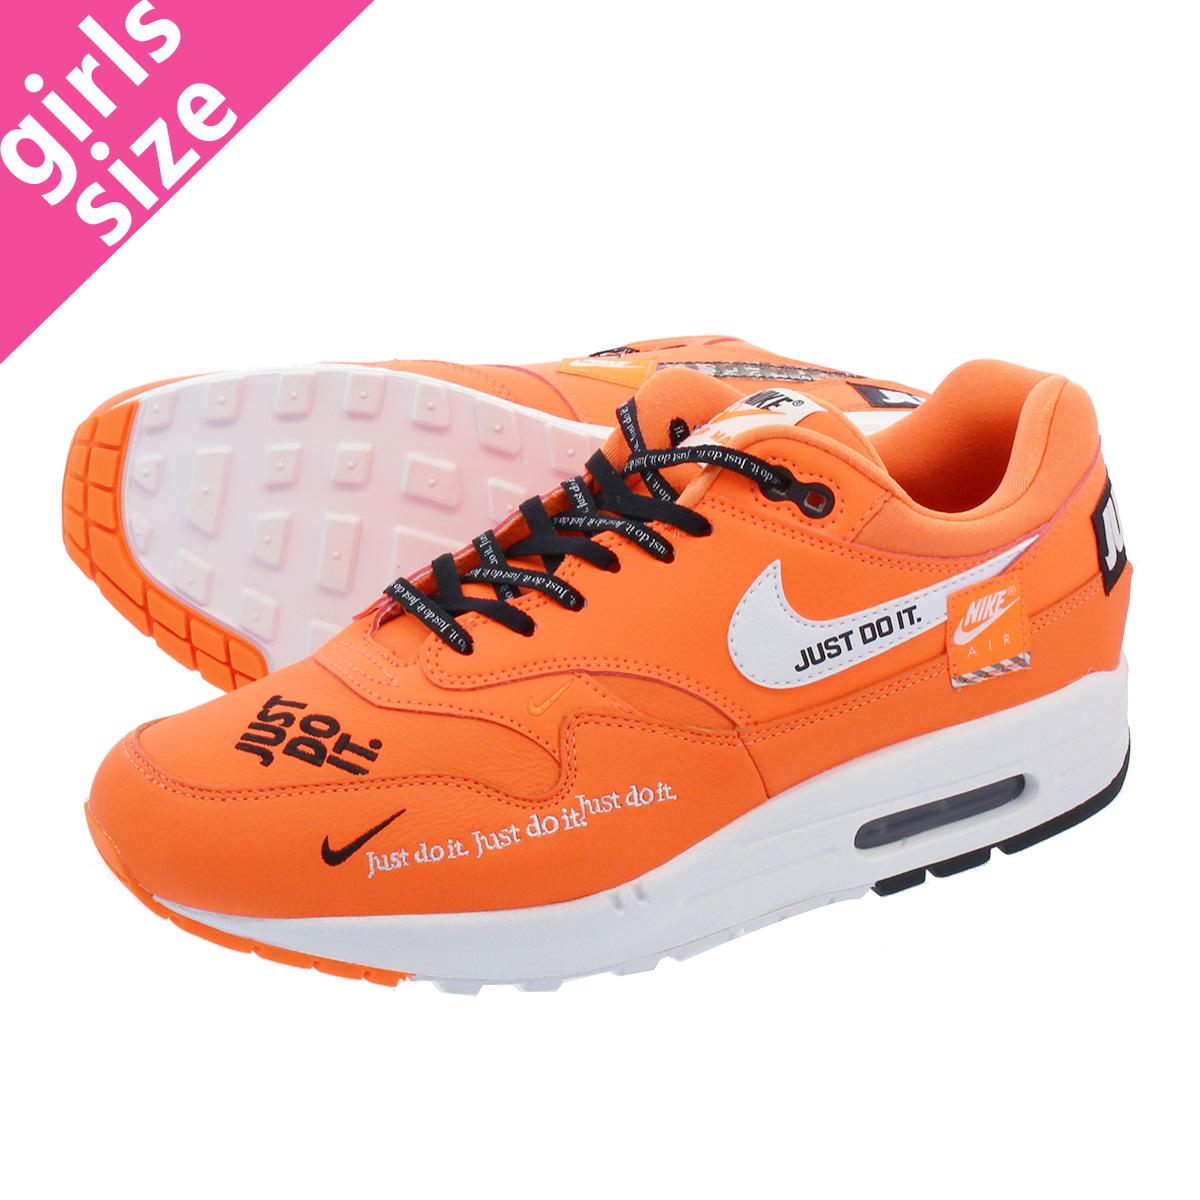 free shipping dee07 2c04c NIKE WMNS AIR MAX 1 LX Nike women Air Max 1 TOTAL ORANGE WHITE BLACK  917,691-800